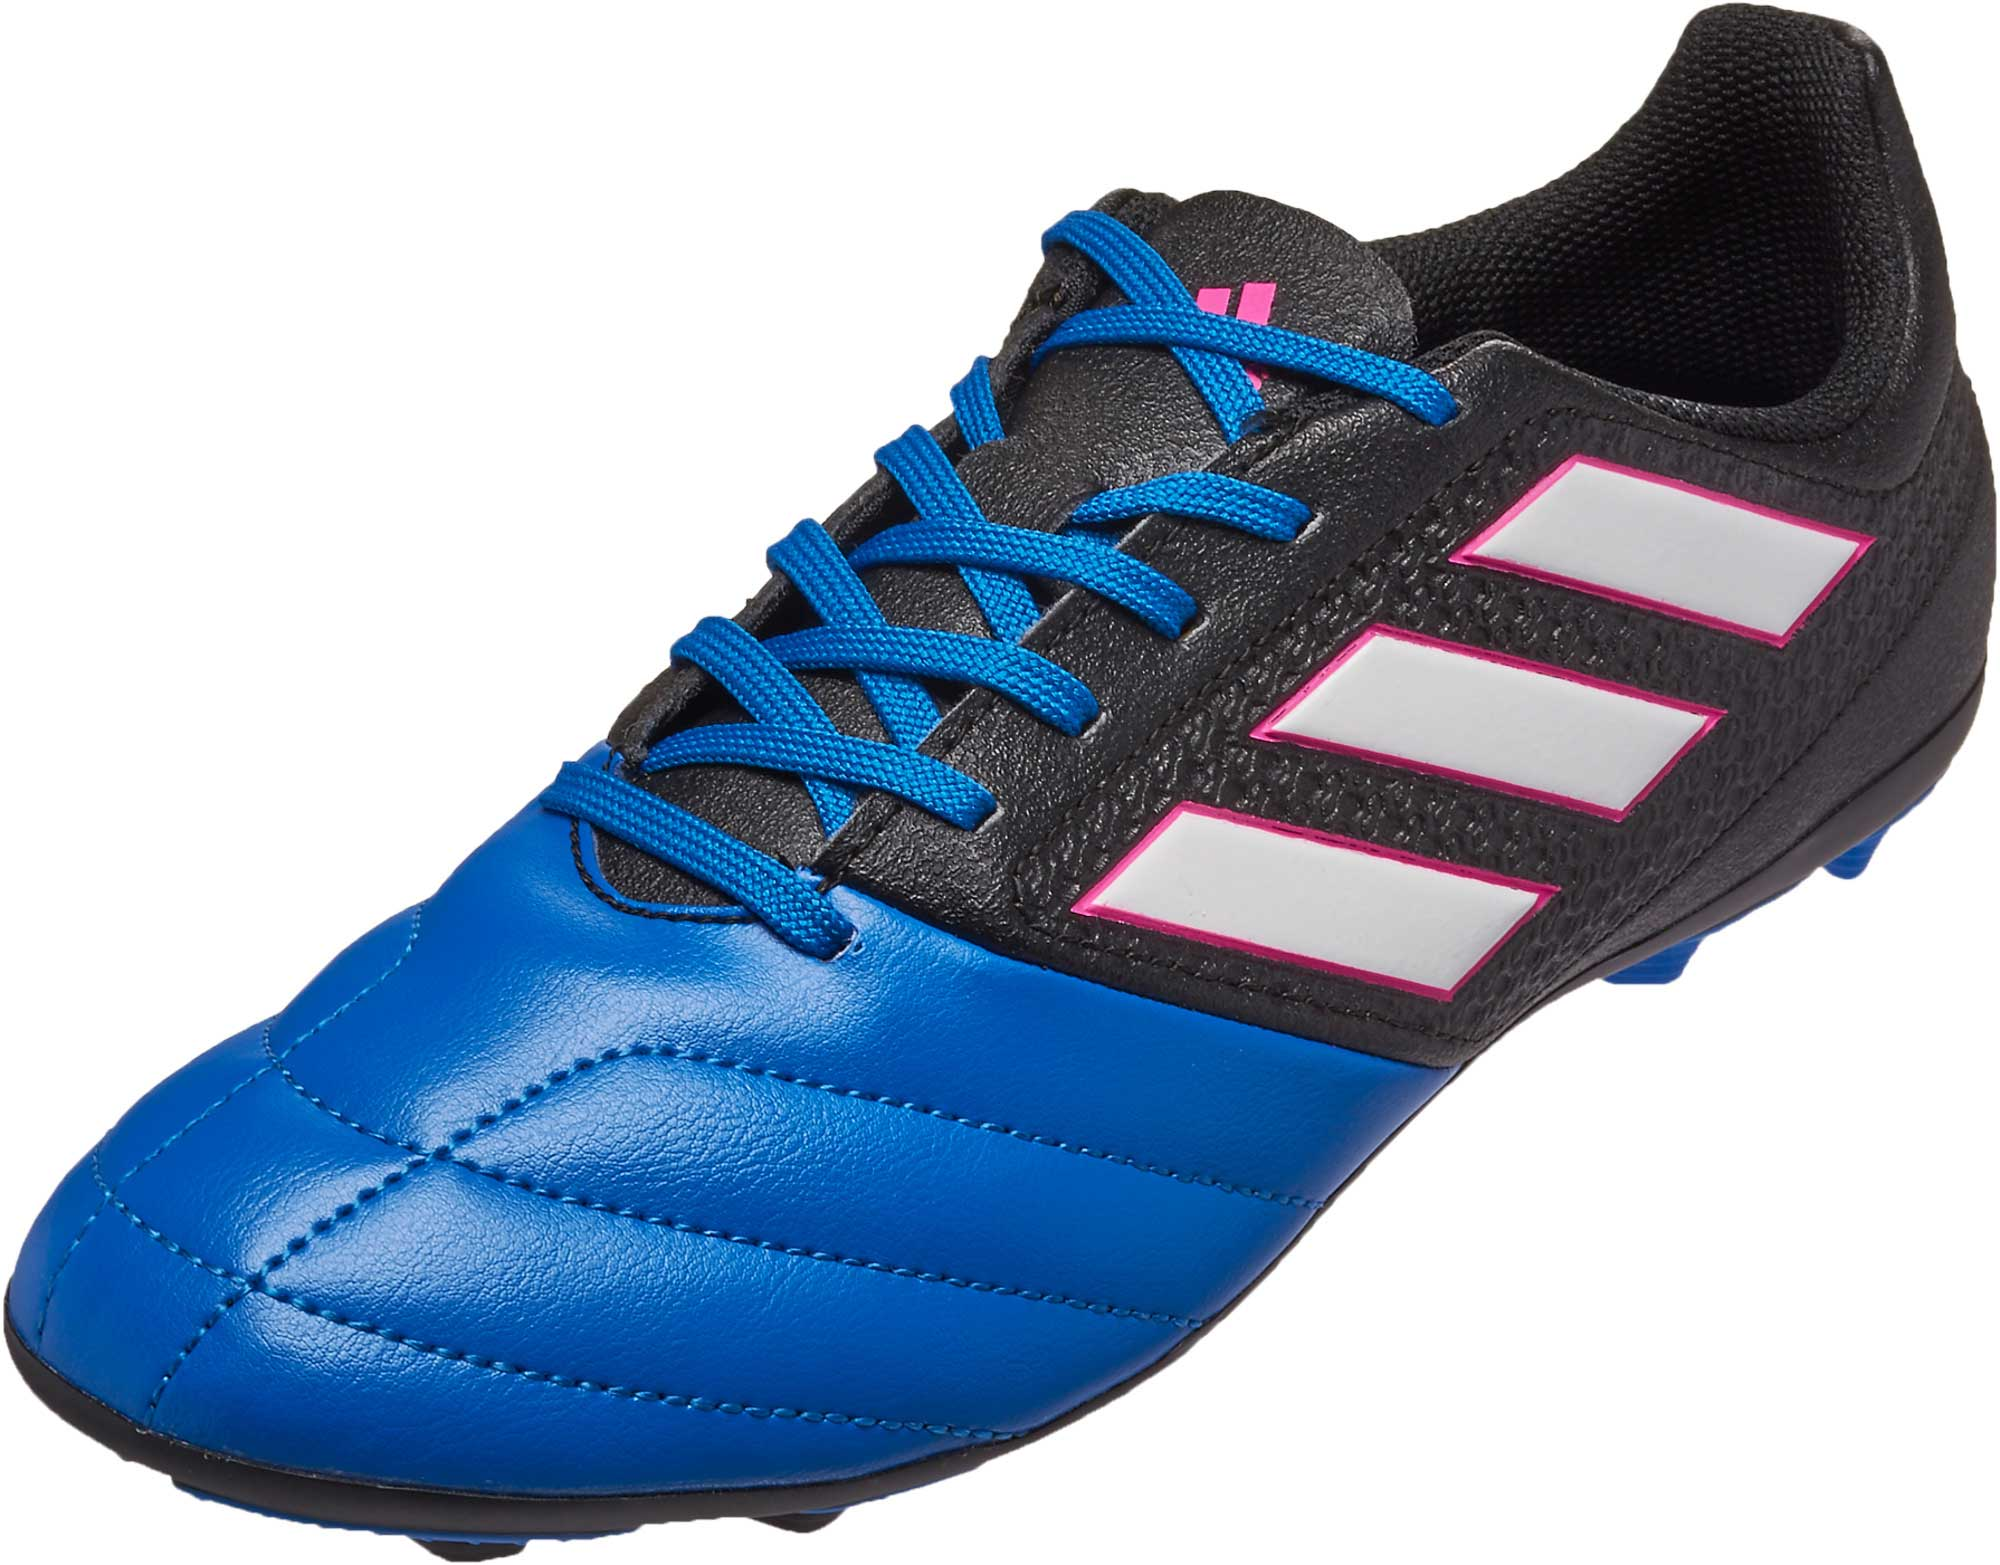 low priced fc1bd 37c95 adidas Kids ACE 17.4 FG – Black/Blue